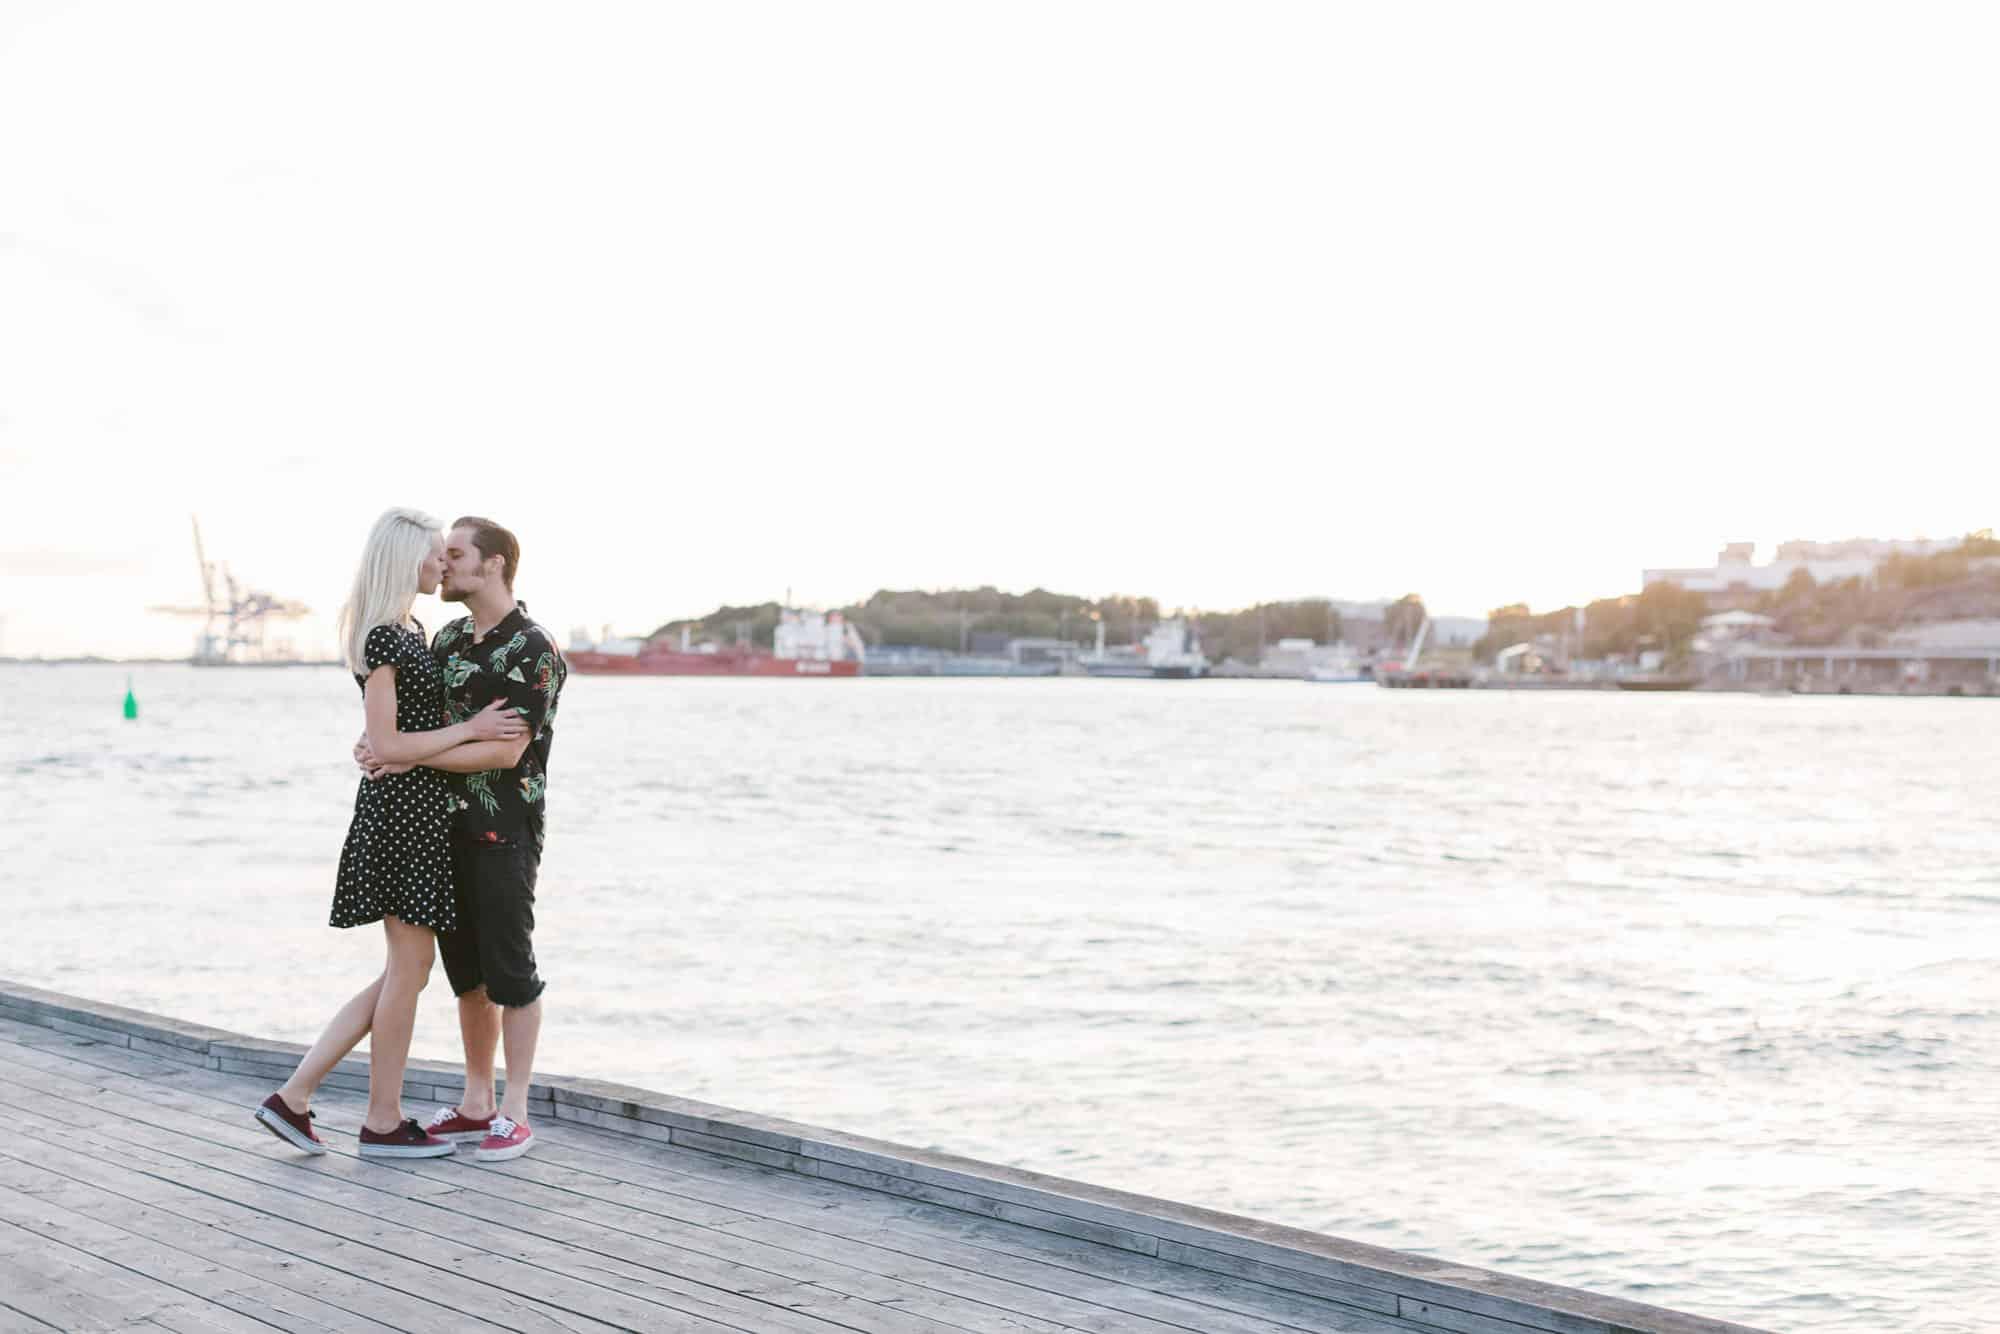 Johanna & Henriks Engagement session by Röda Sten in Gothenburg